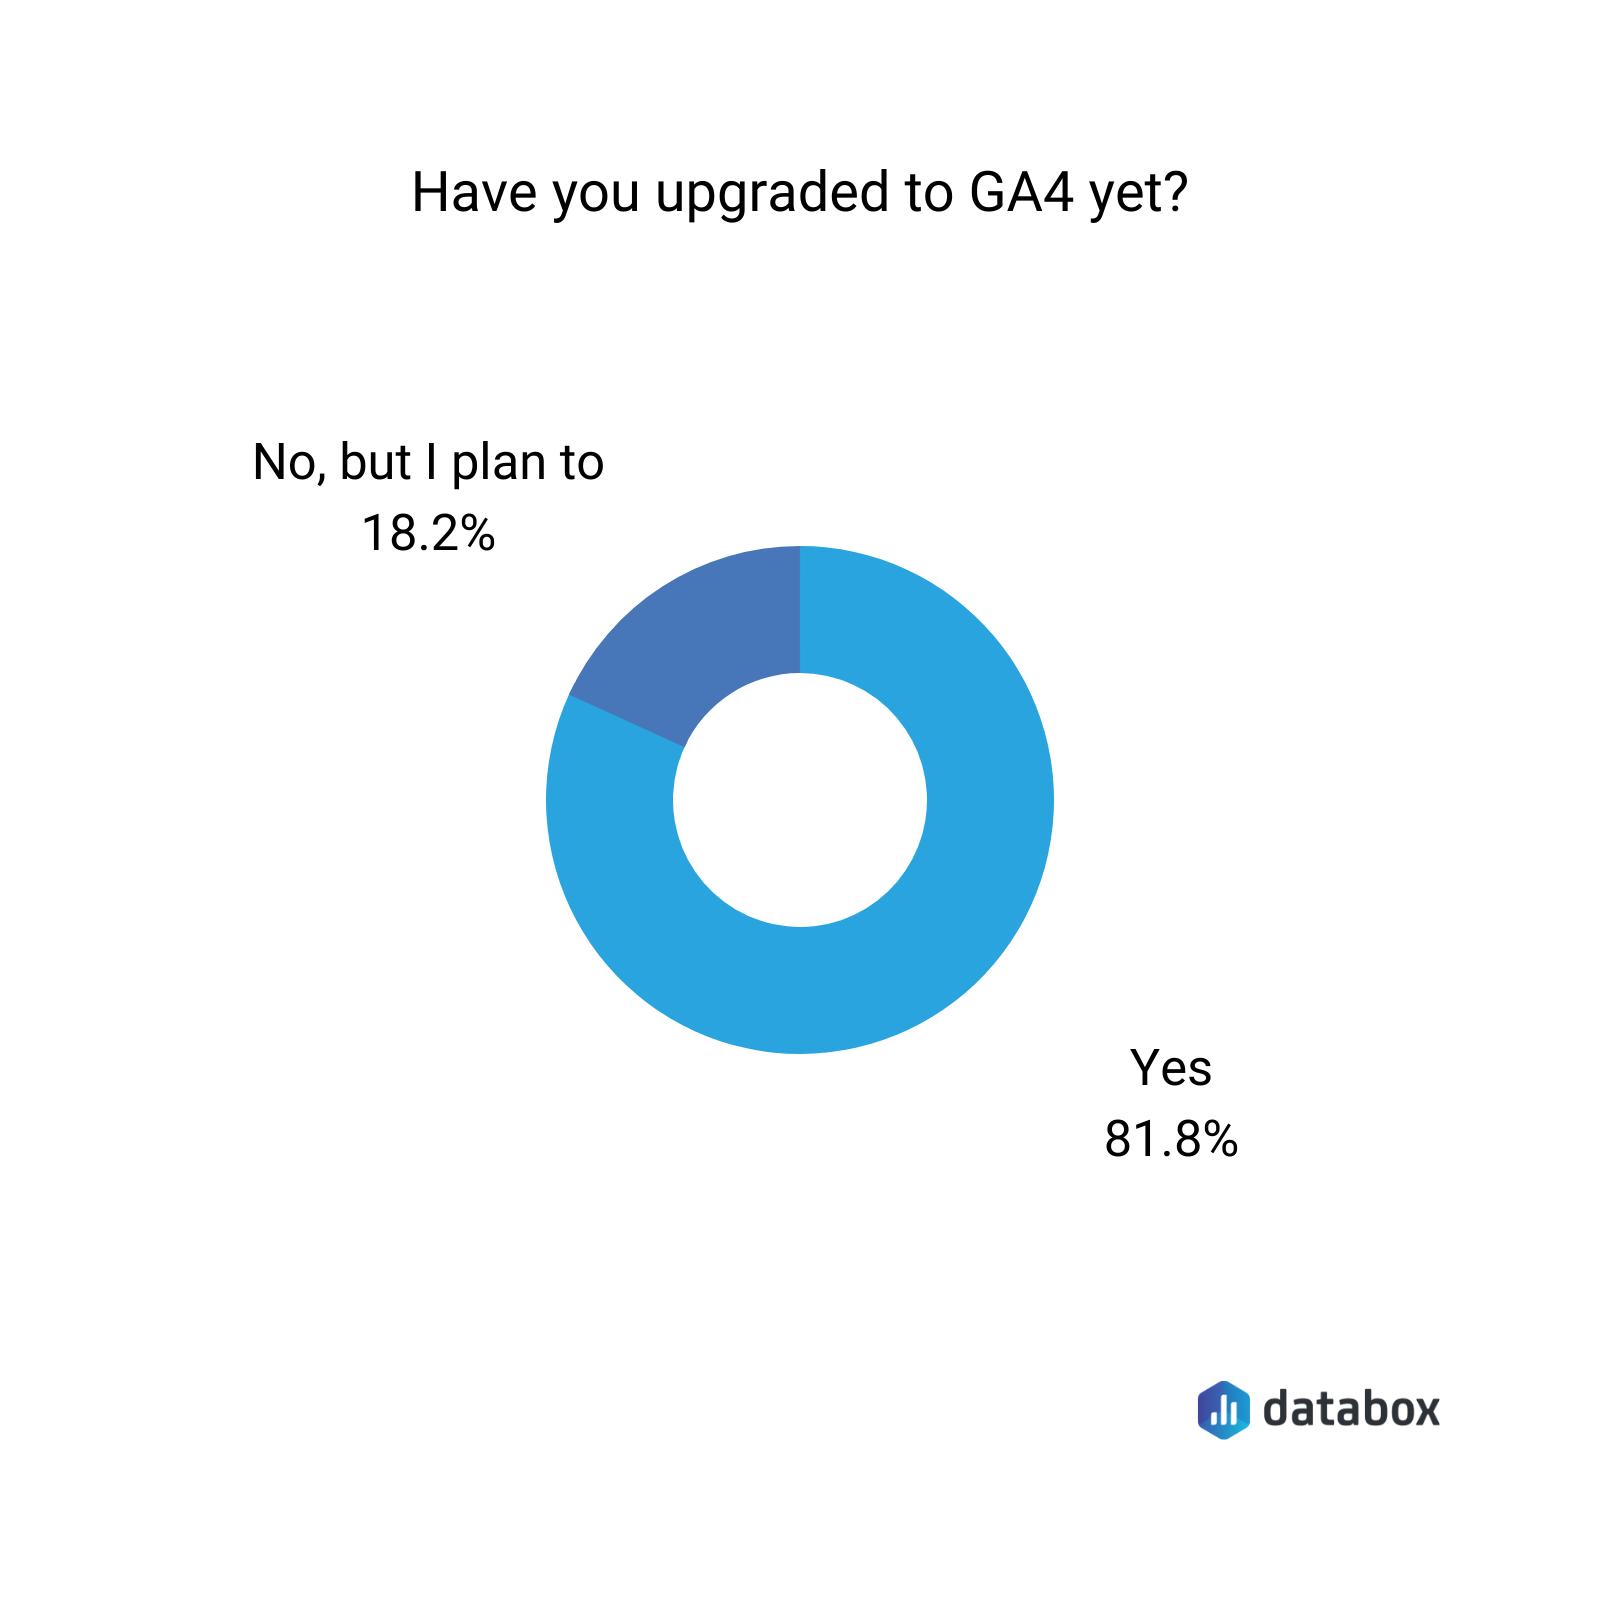 upgrading to GA4